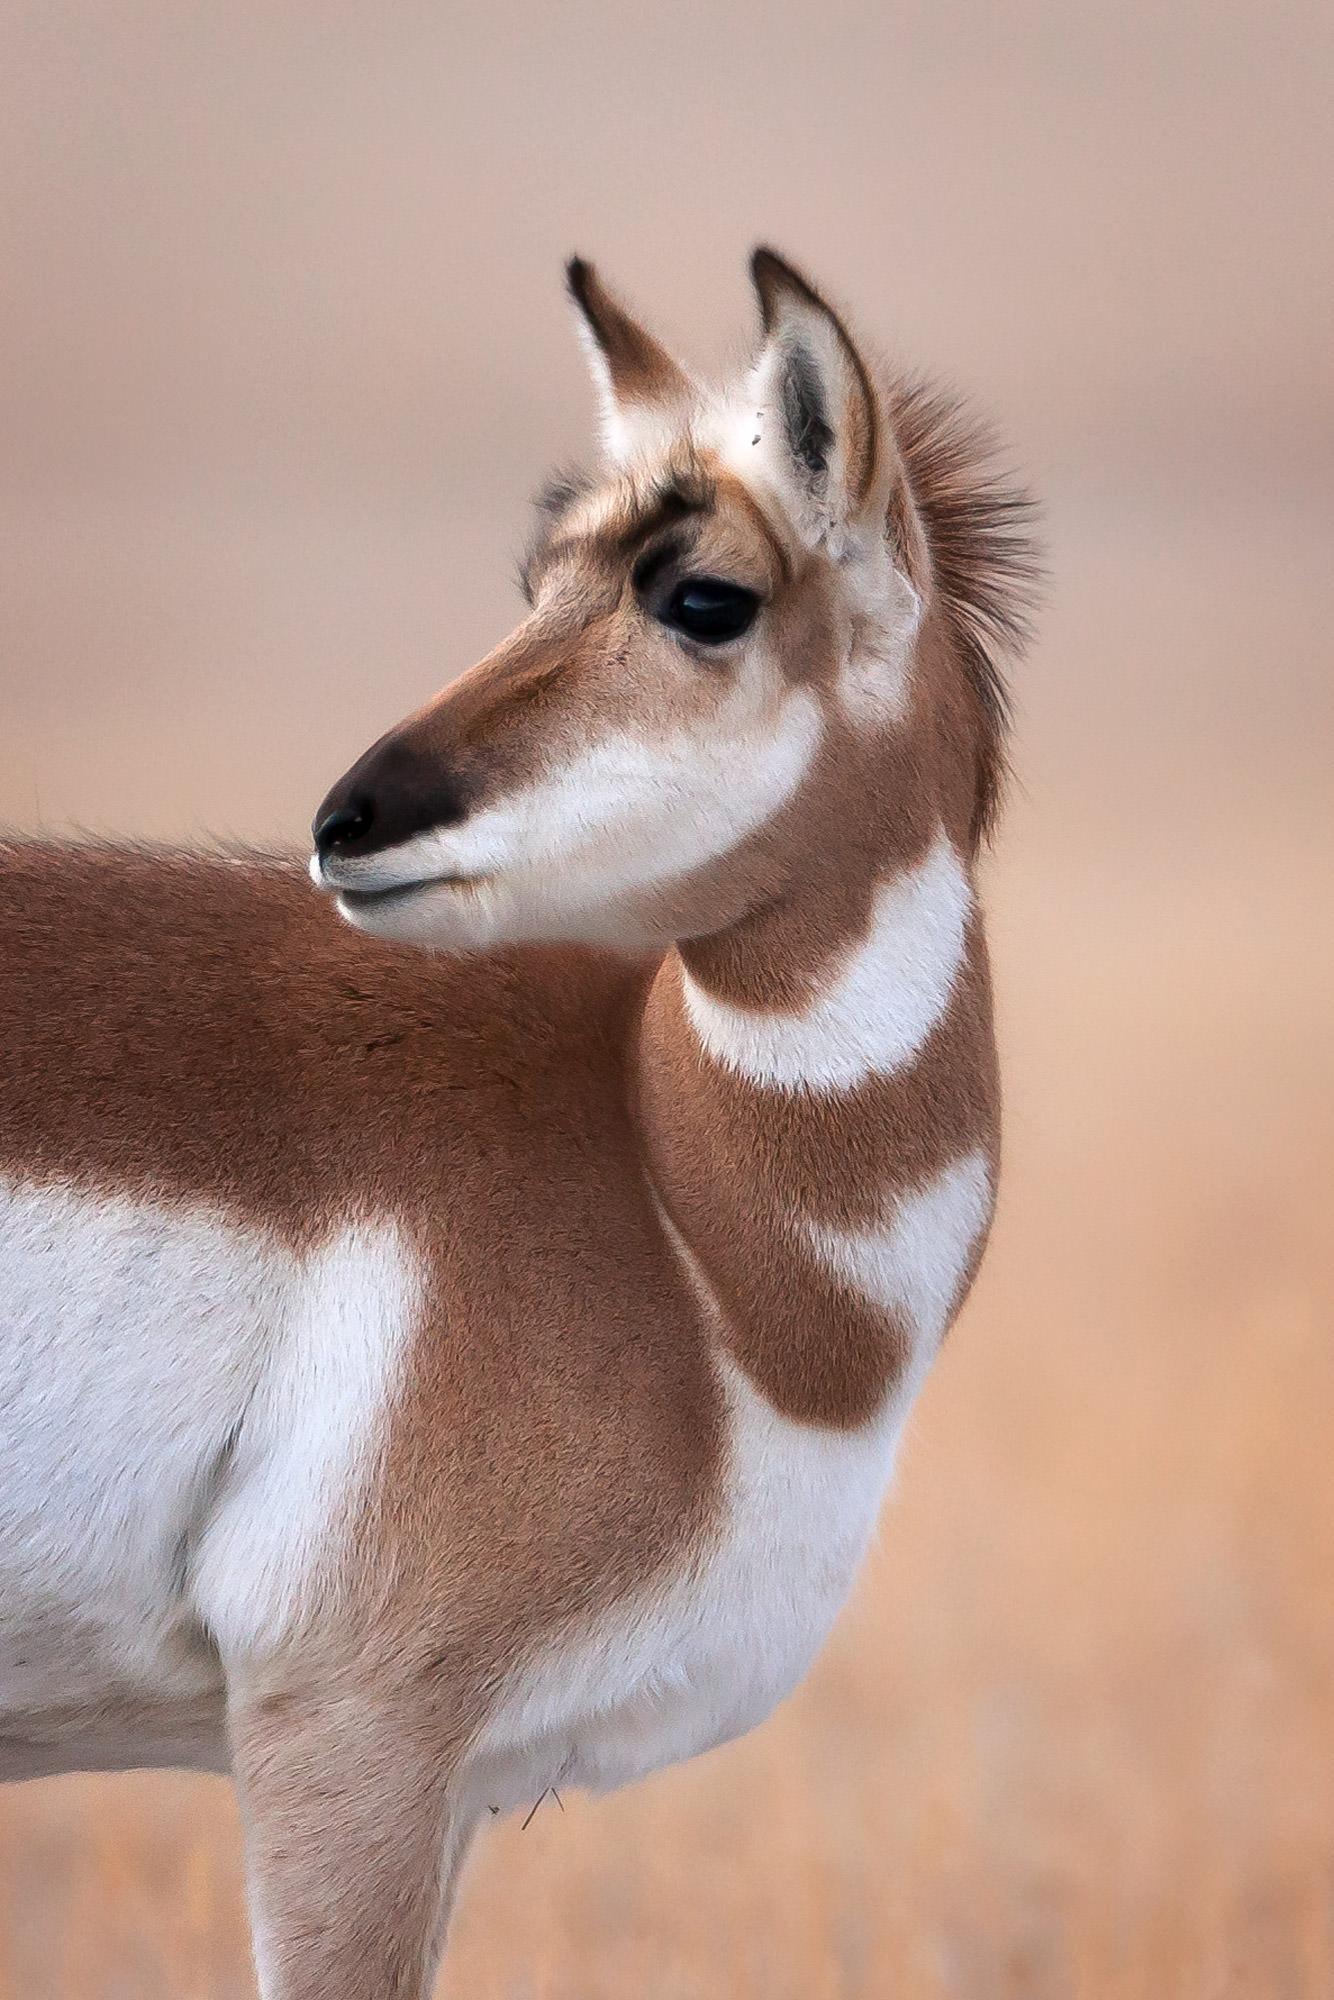 Pronghorn, Antelope, Wyoming, Yellowstone, limited edition, photograph, fine art, wildlife, photo